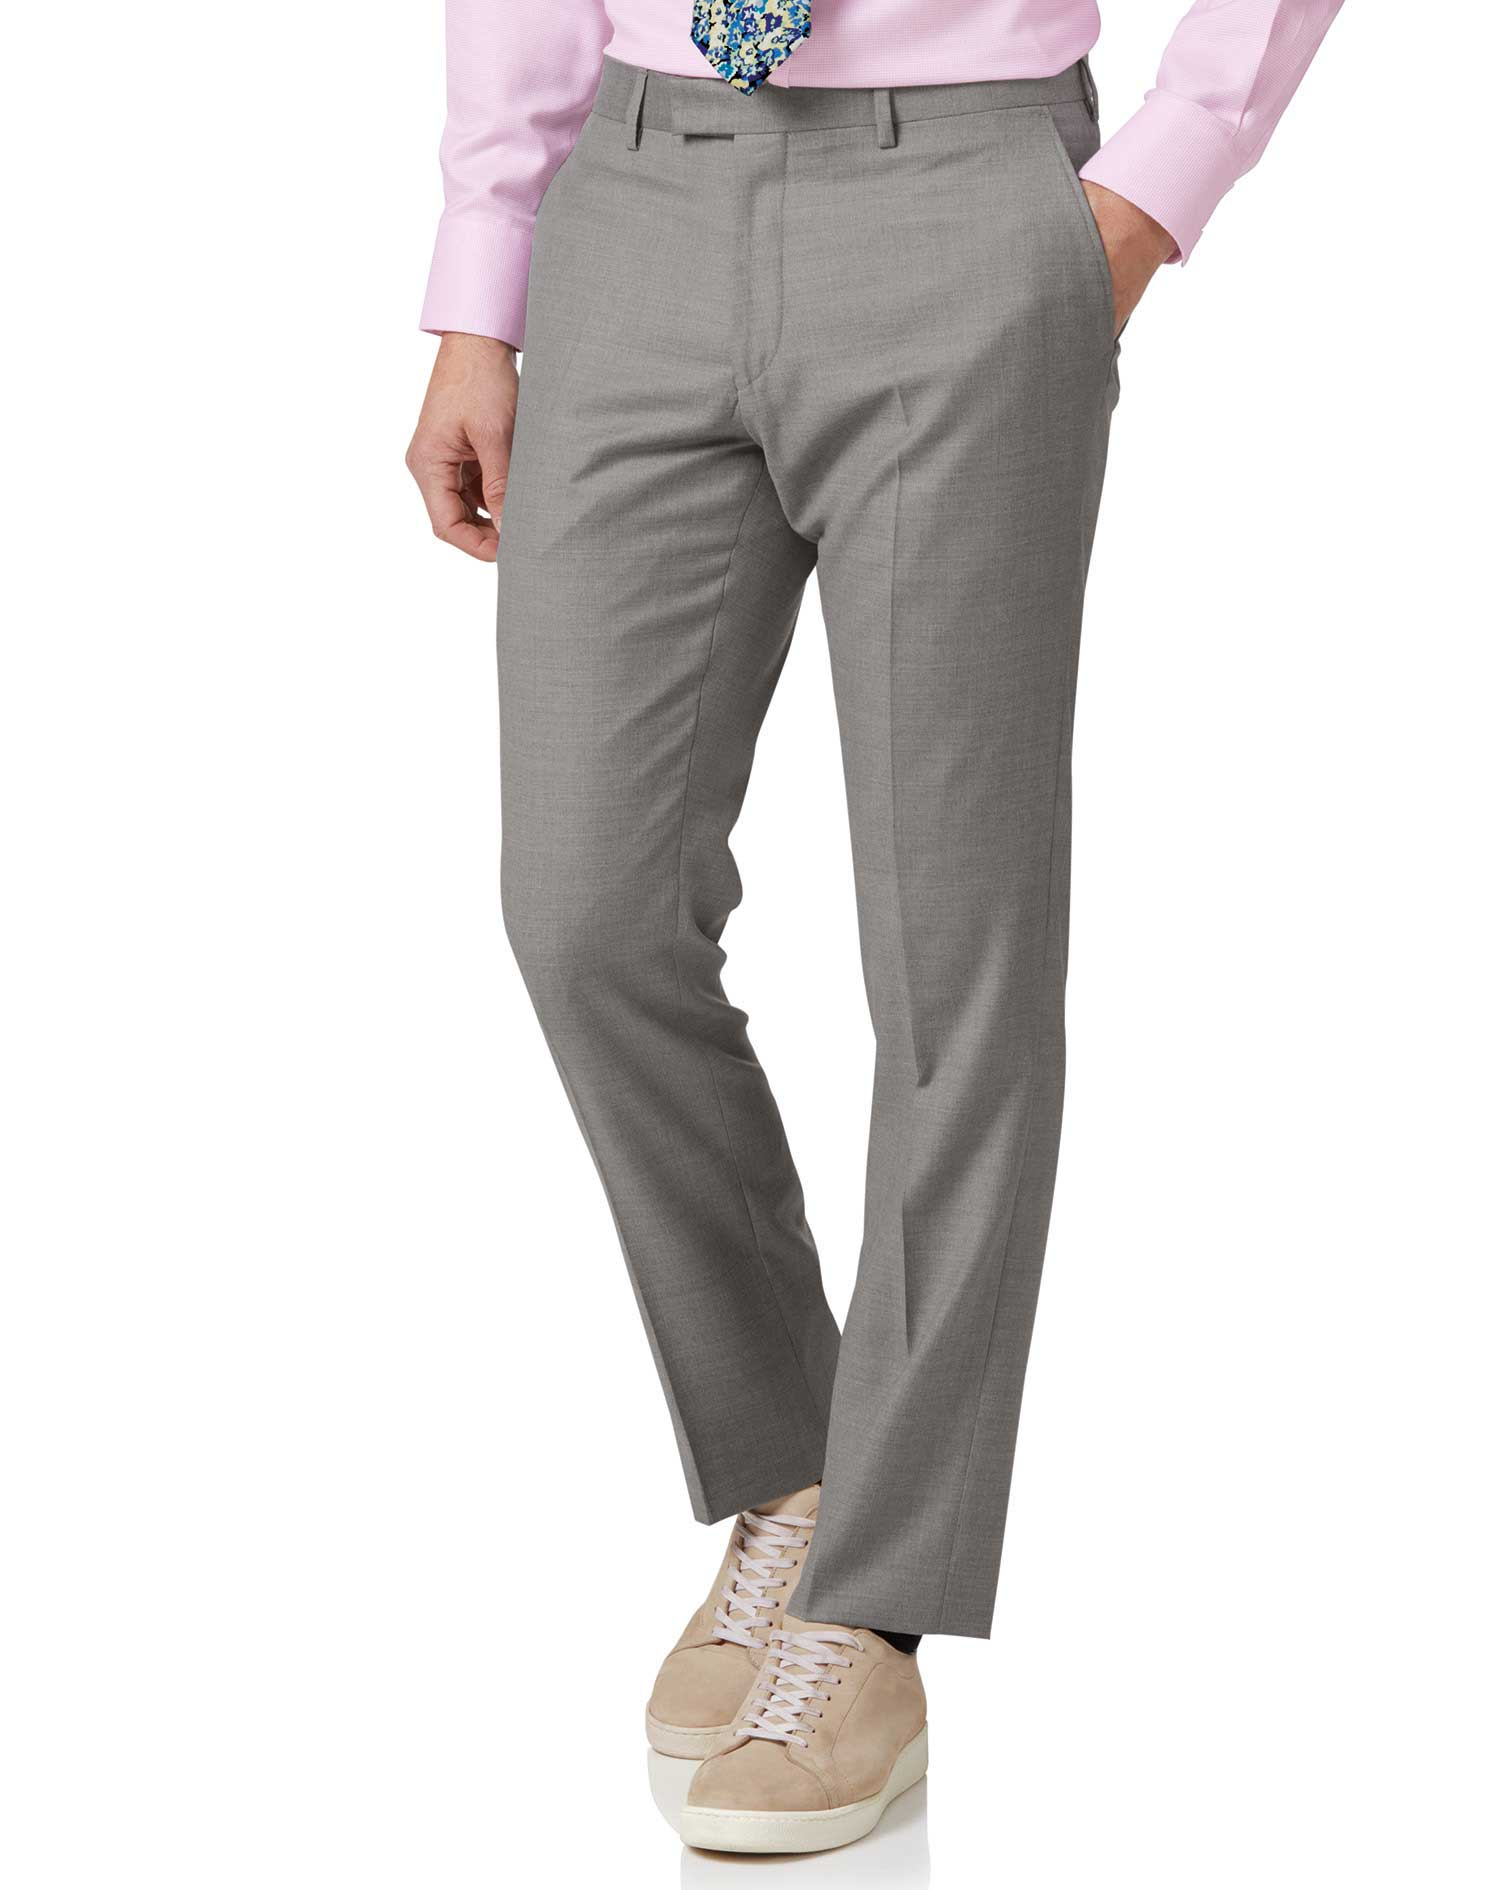 Silver Slim Fit Italian Suit Trouser Size W34 L38 by Charles Tyrwhitt